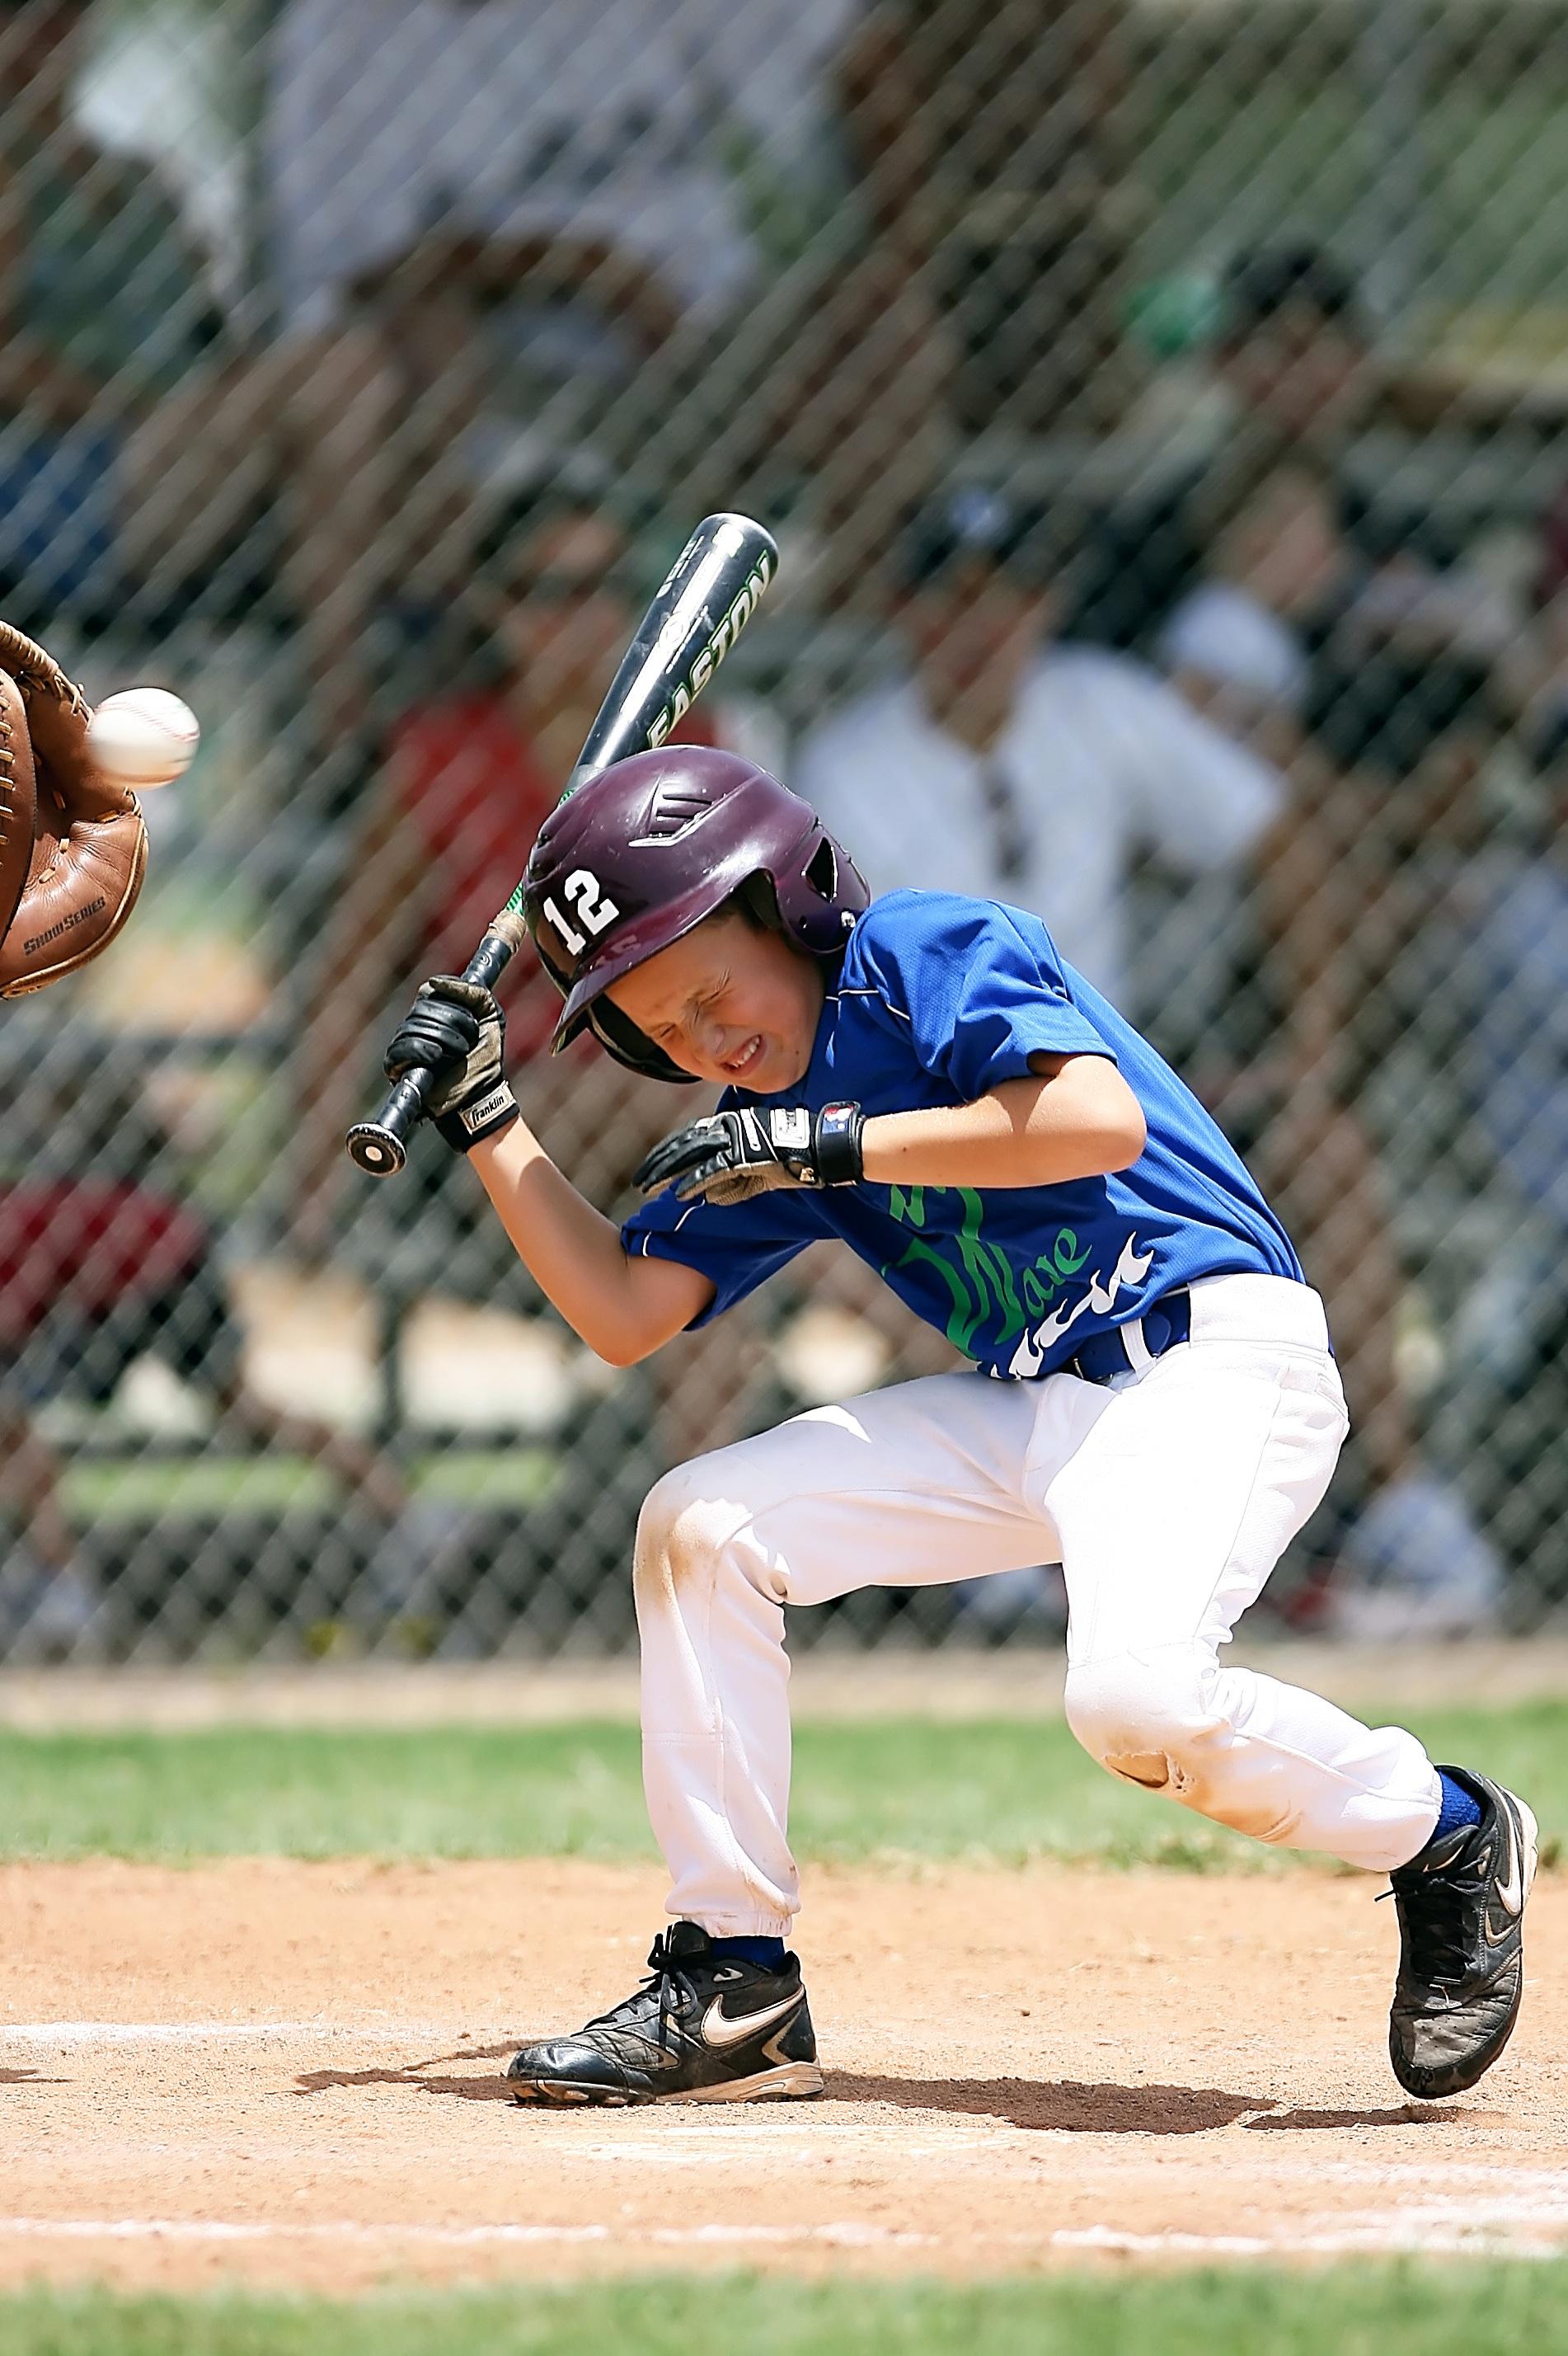 apollo sports baseball - HD1902×2857